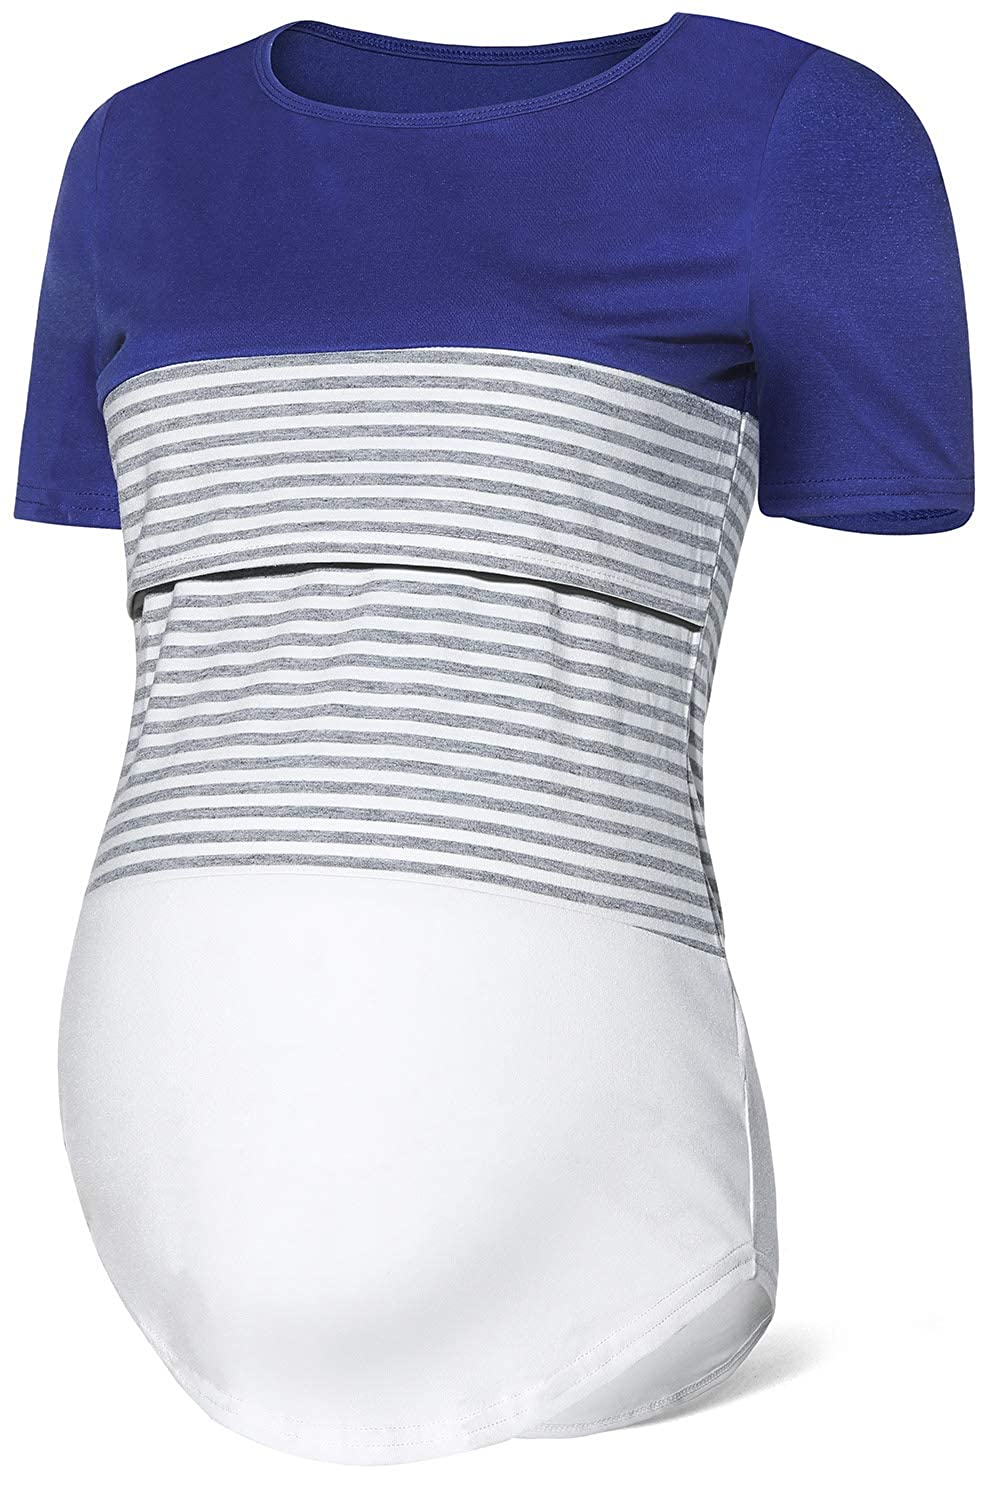 SUNNYBUY Womens Long Sleeve Nursing Top Shirt Maternity Breastfeeding Tops Clothes Casual Sweatshirt with Pocket